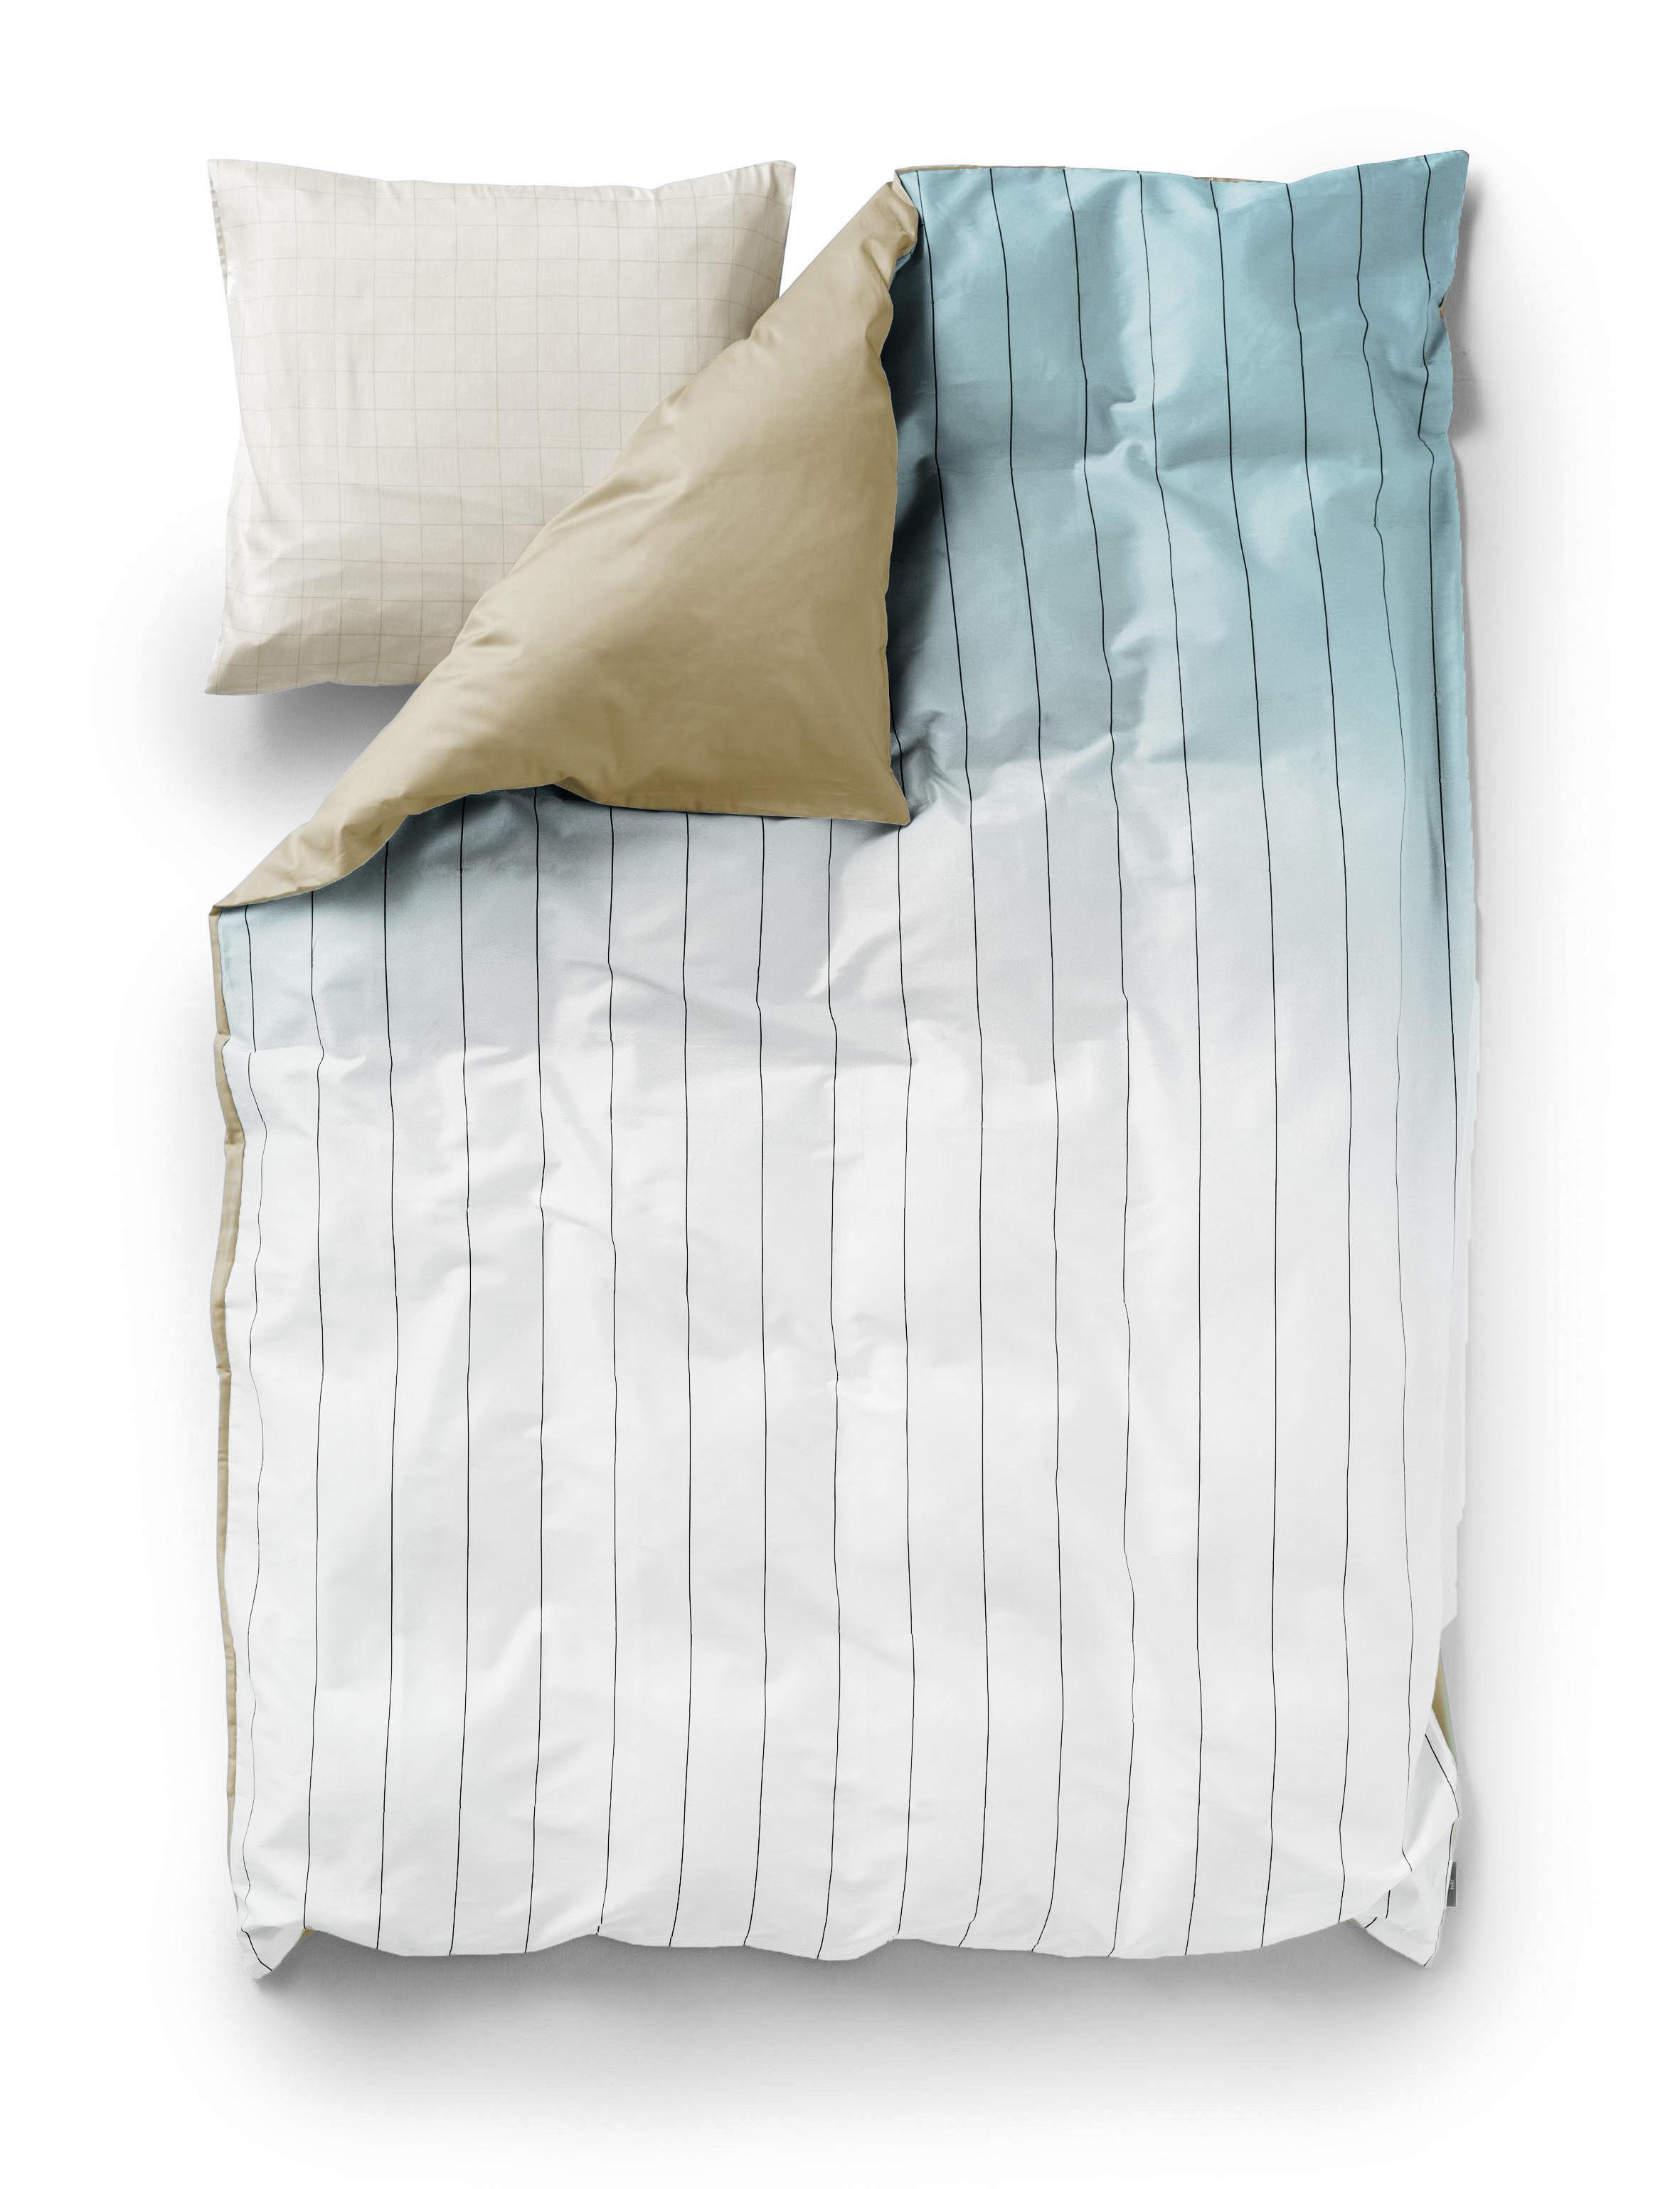 s b minimal f r 1 person 140 x 200 cm hay bettw sche set f r 1 person. Black Bedroom Furniture Sets. Home Design Ideas